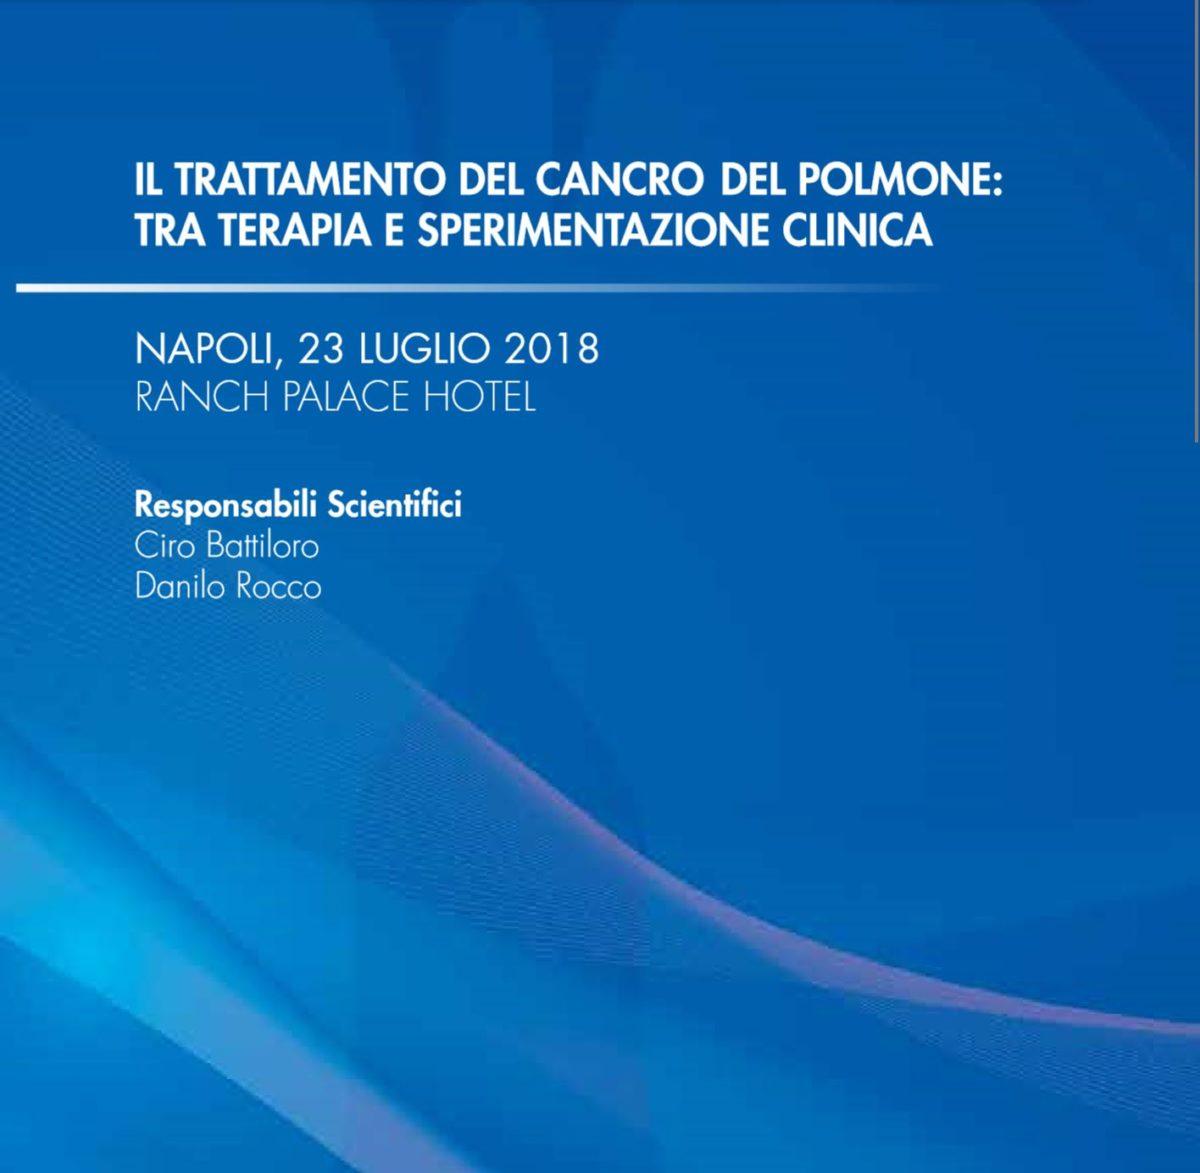 TrattamentoCancroPolmone-1200x1173.jpg